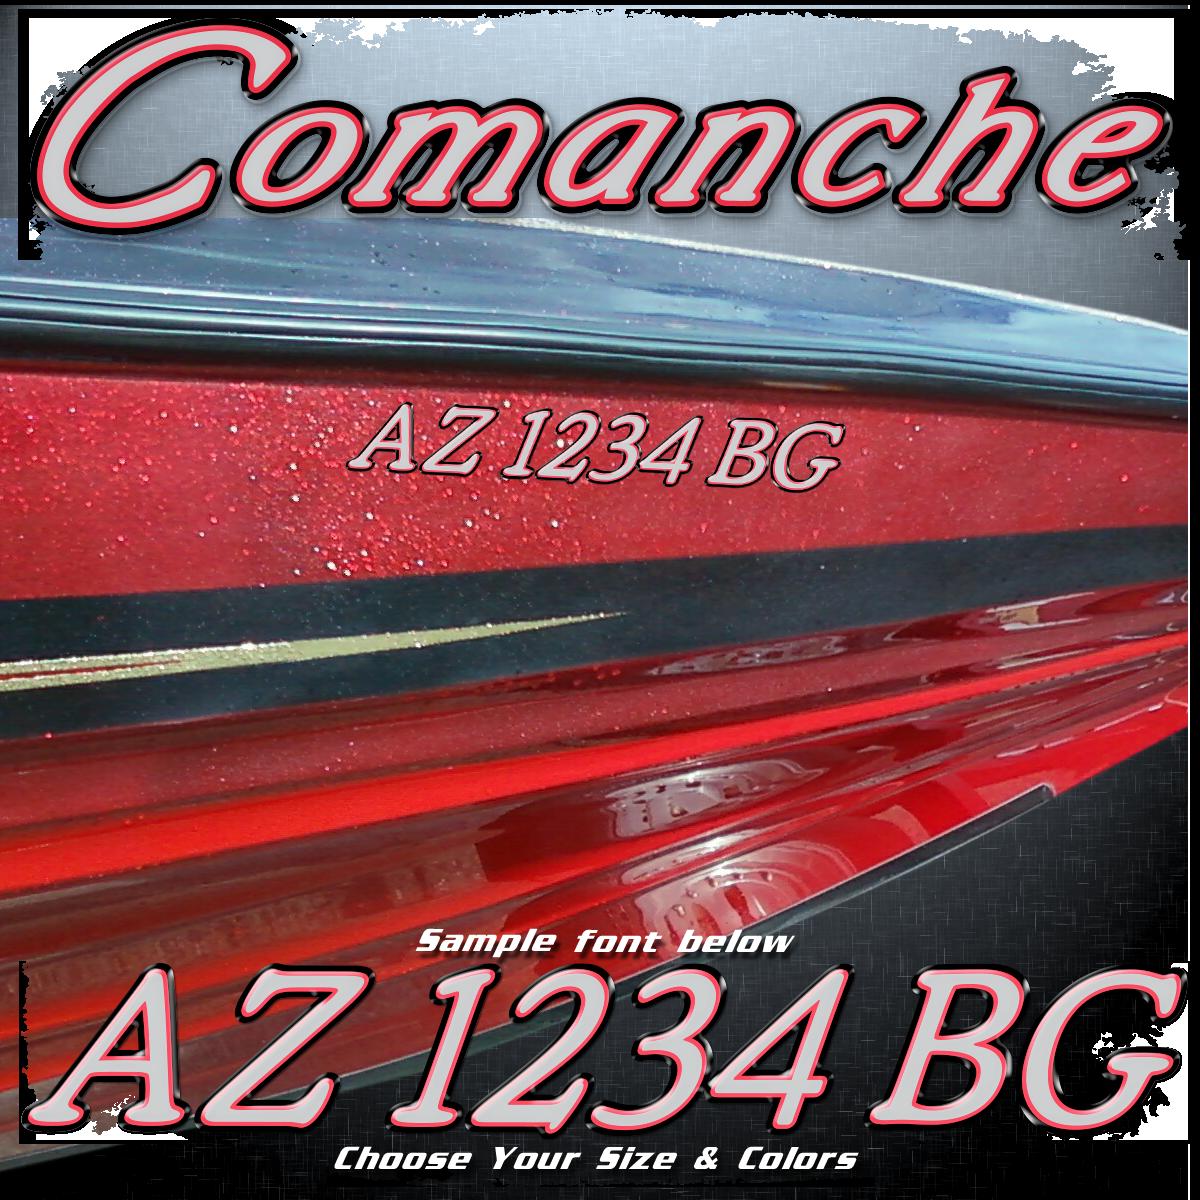 Ranger Comanche Font Registration, Choose Your Colors (2 included)